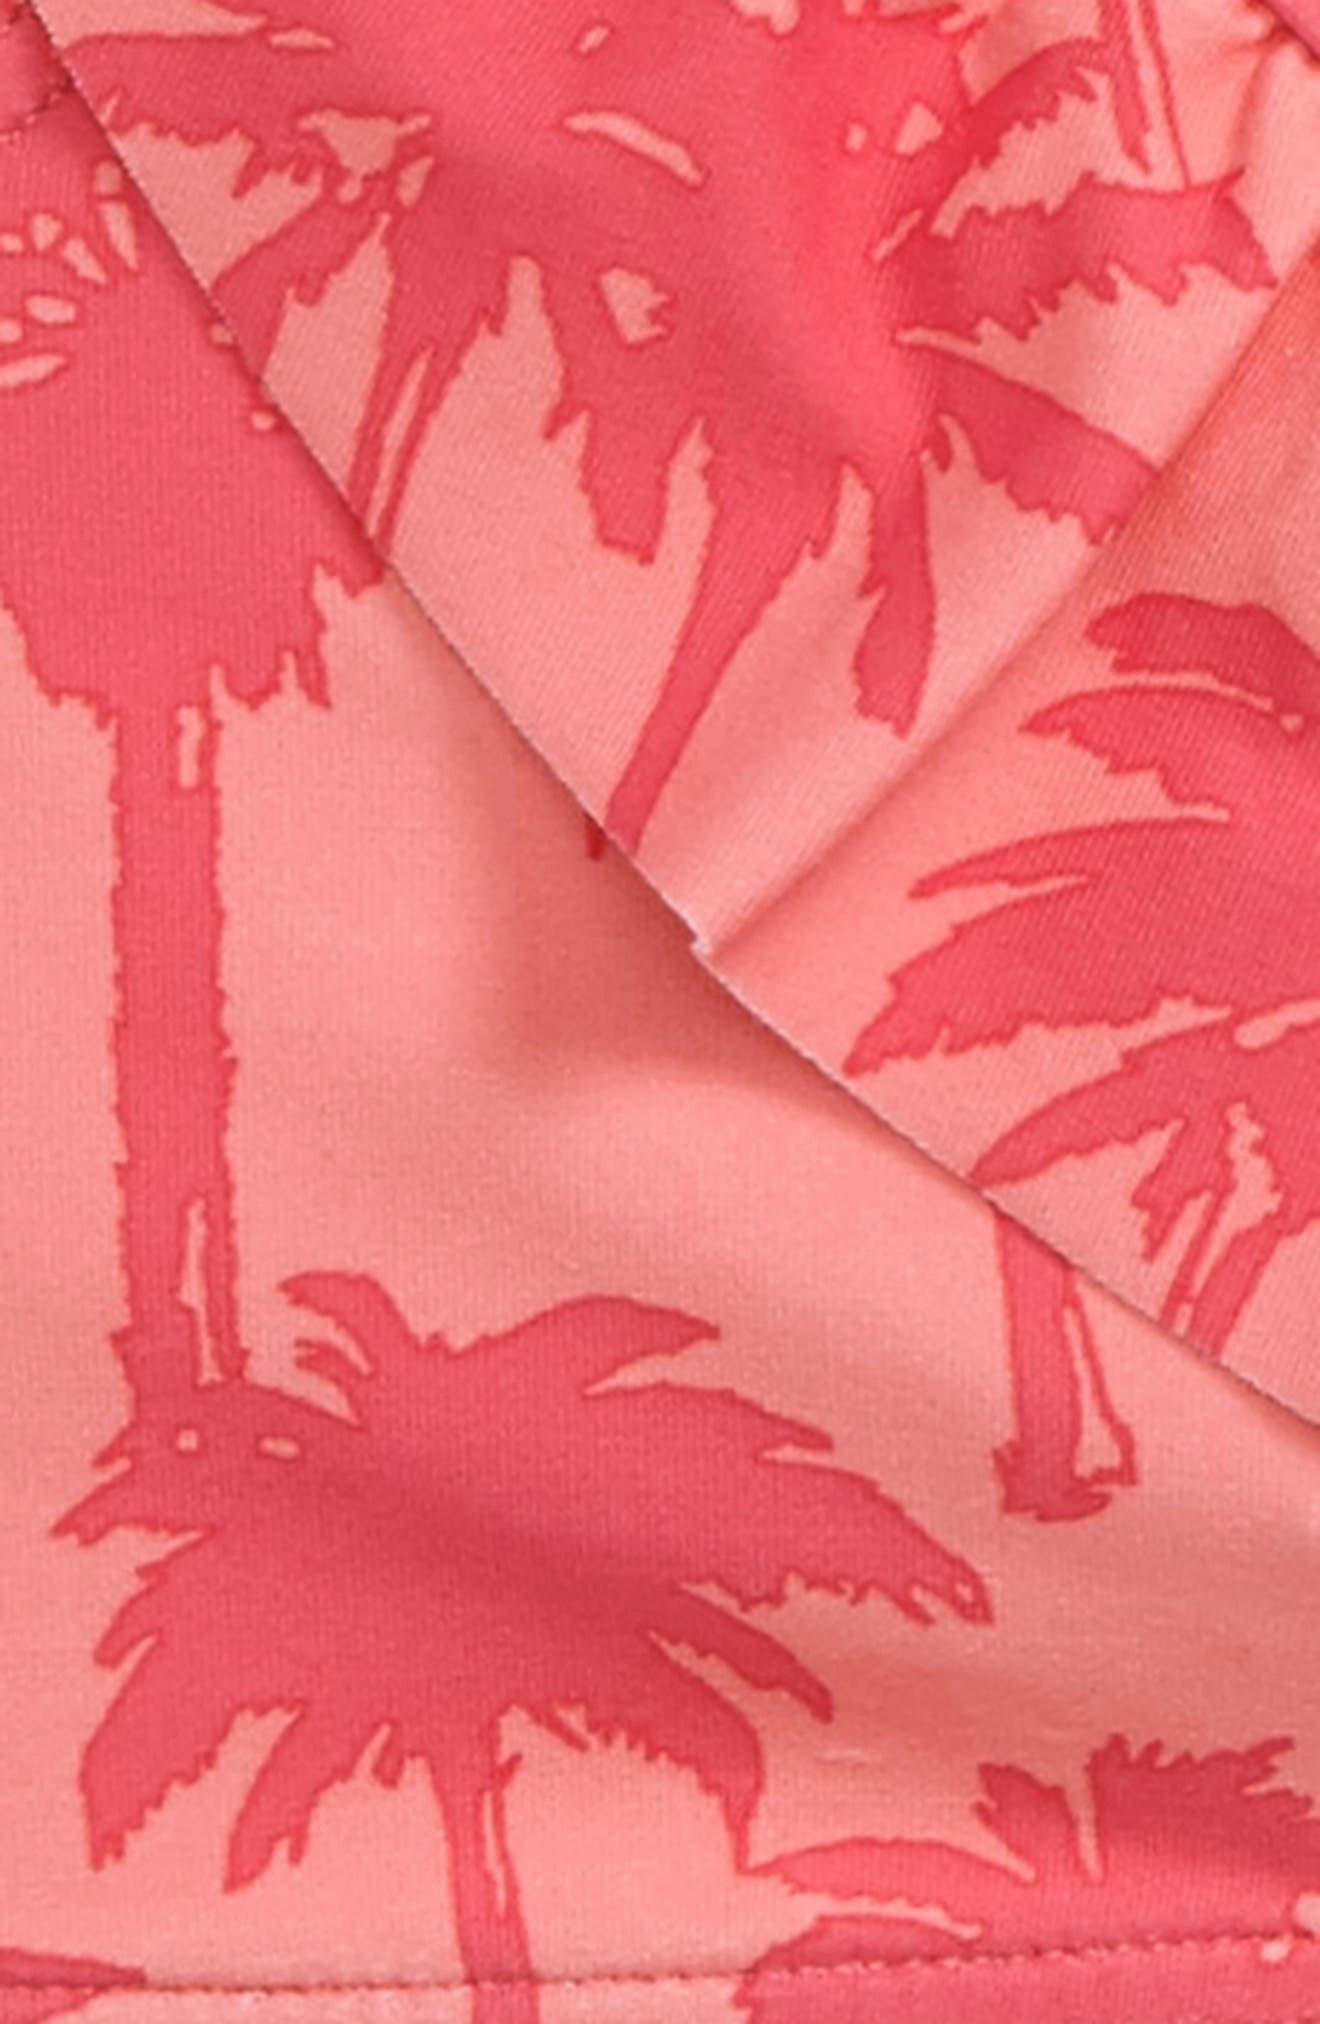 Palm Print Two-Piece Swimsuit,                             Alternate thumbnail 2, color,                             950